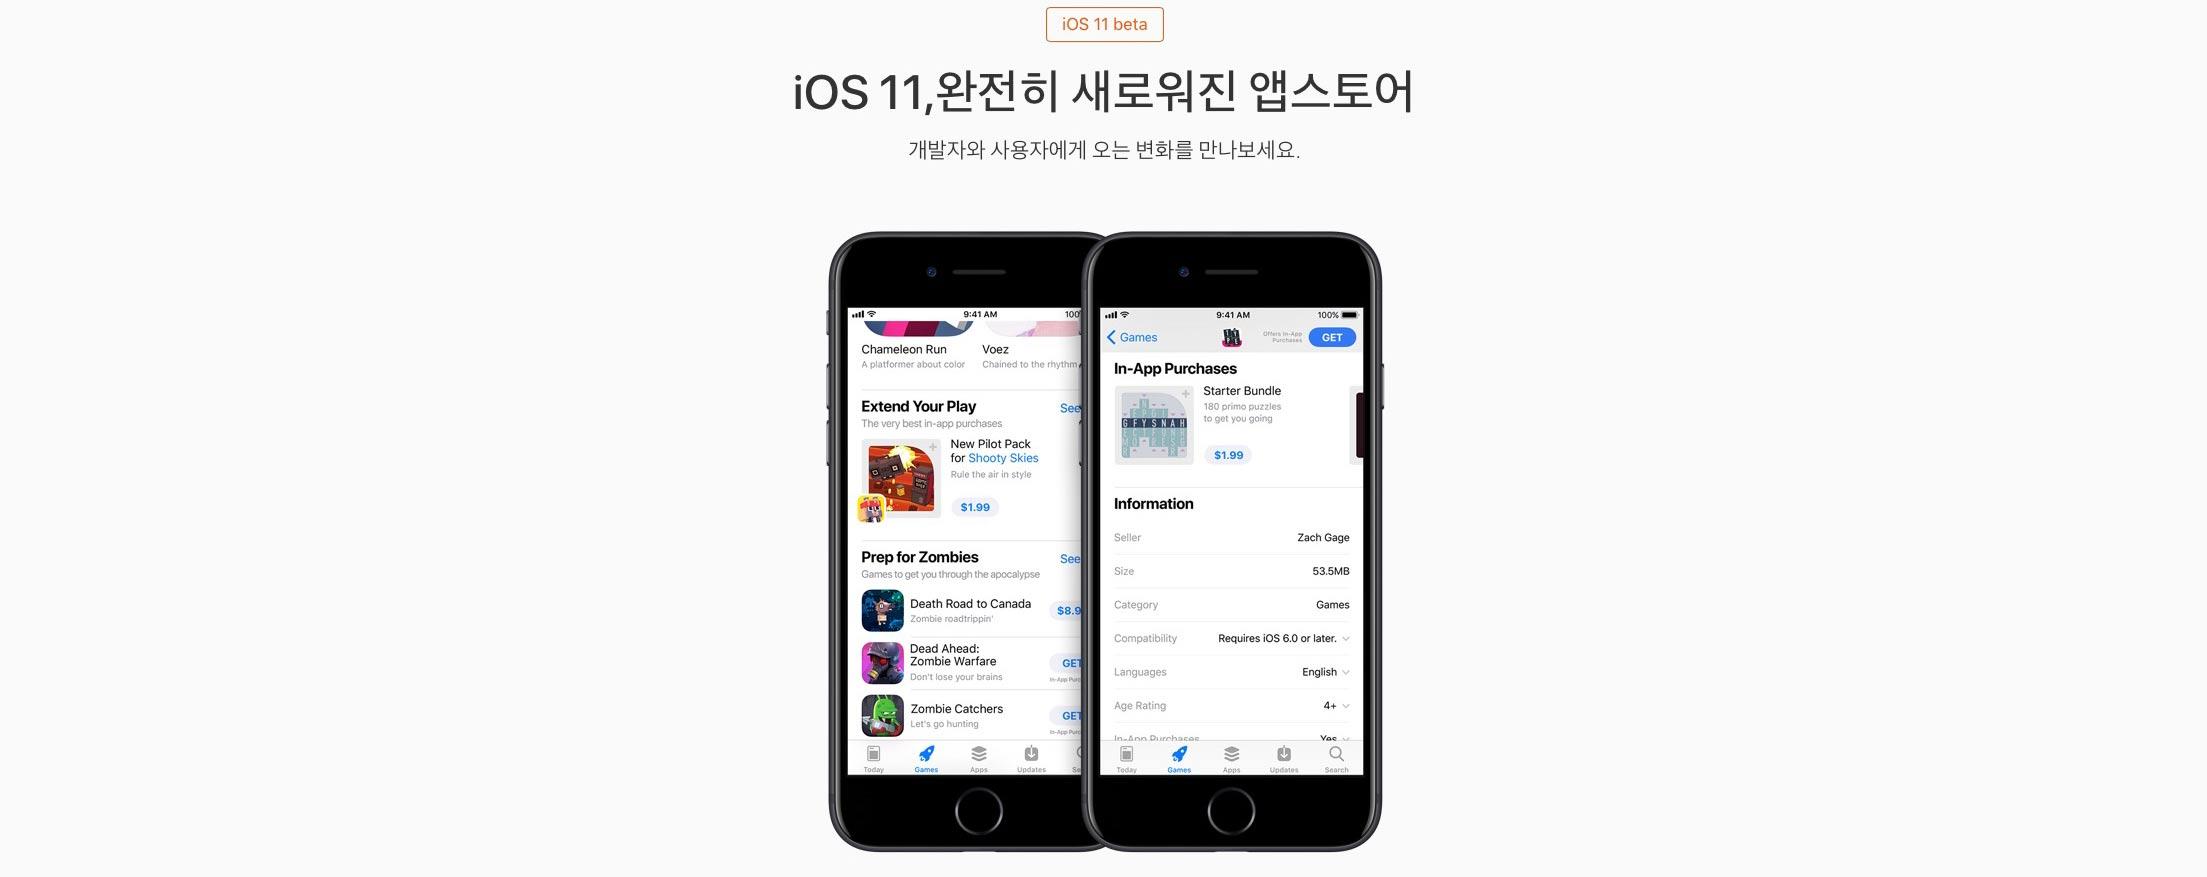 iOS 11, 완전히 새로워진 앱스토어